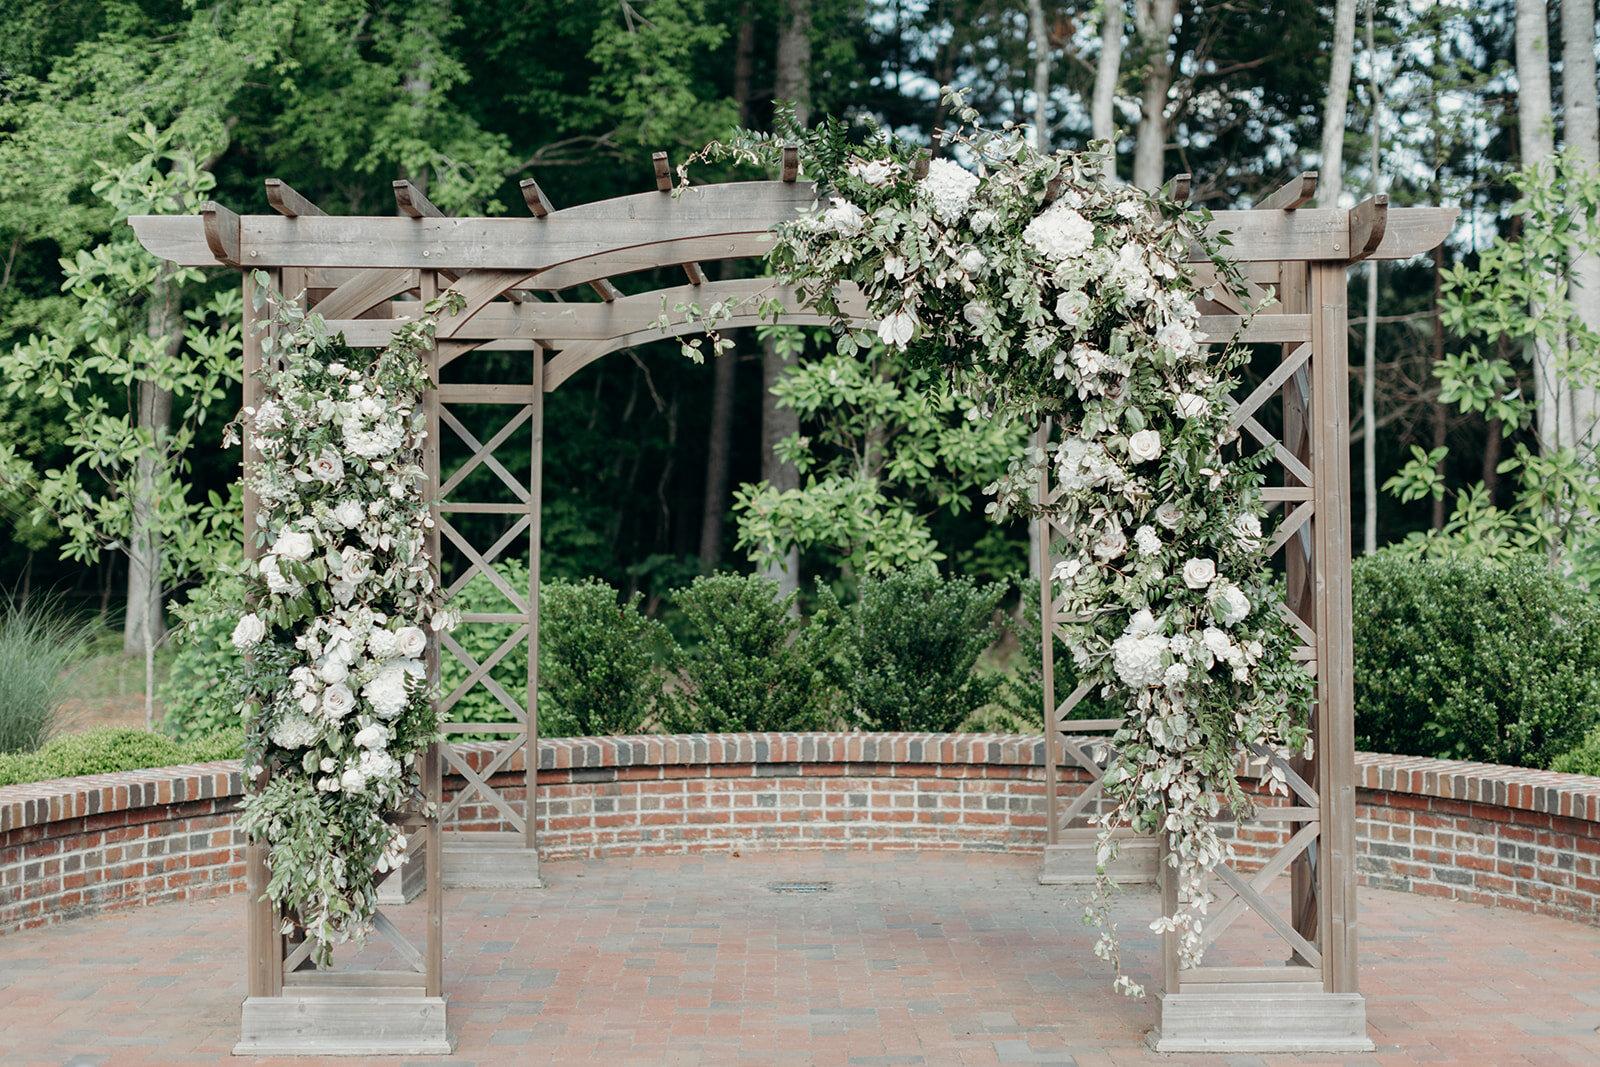 barn_of_Chapel_hill_wedding_pergola_asymmetrical.jpg